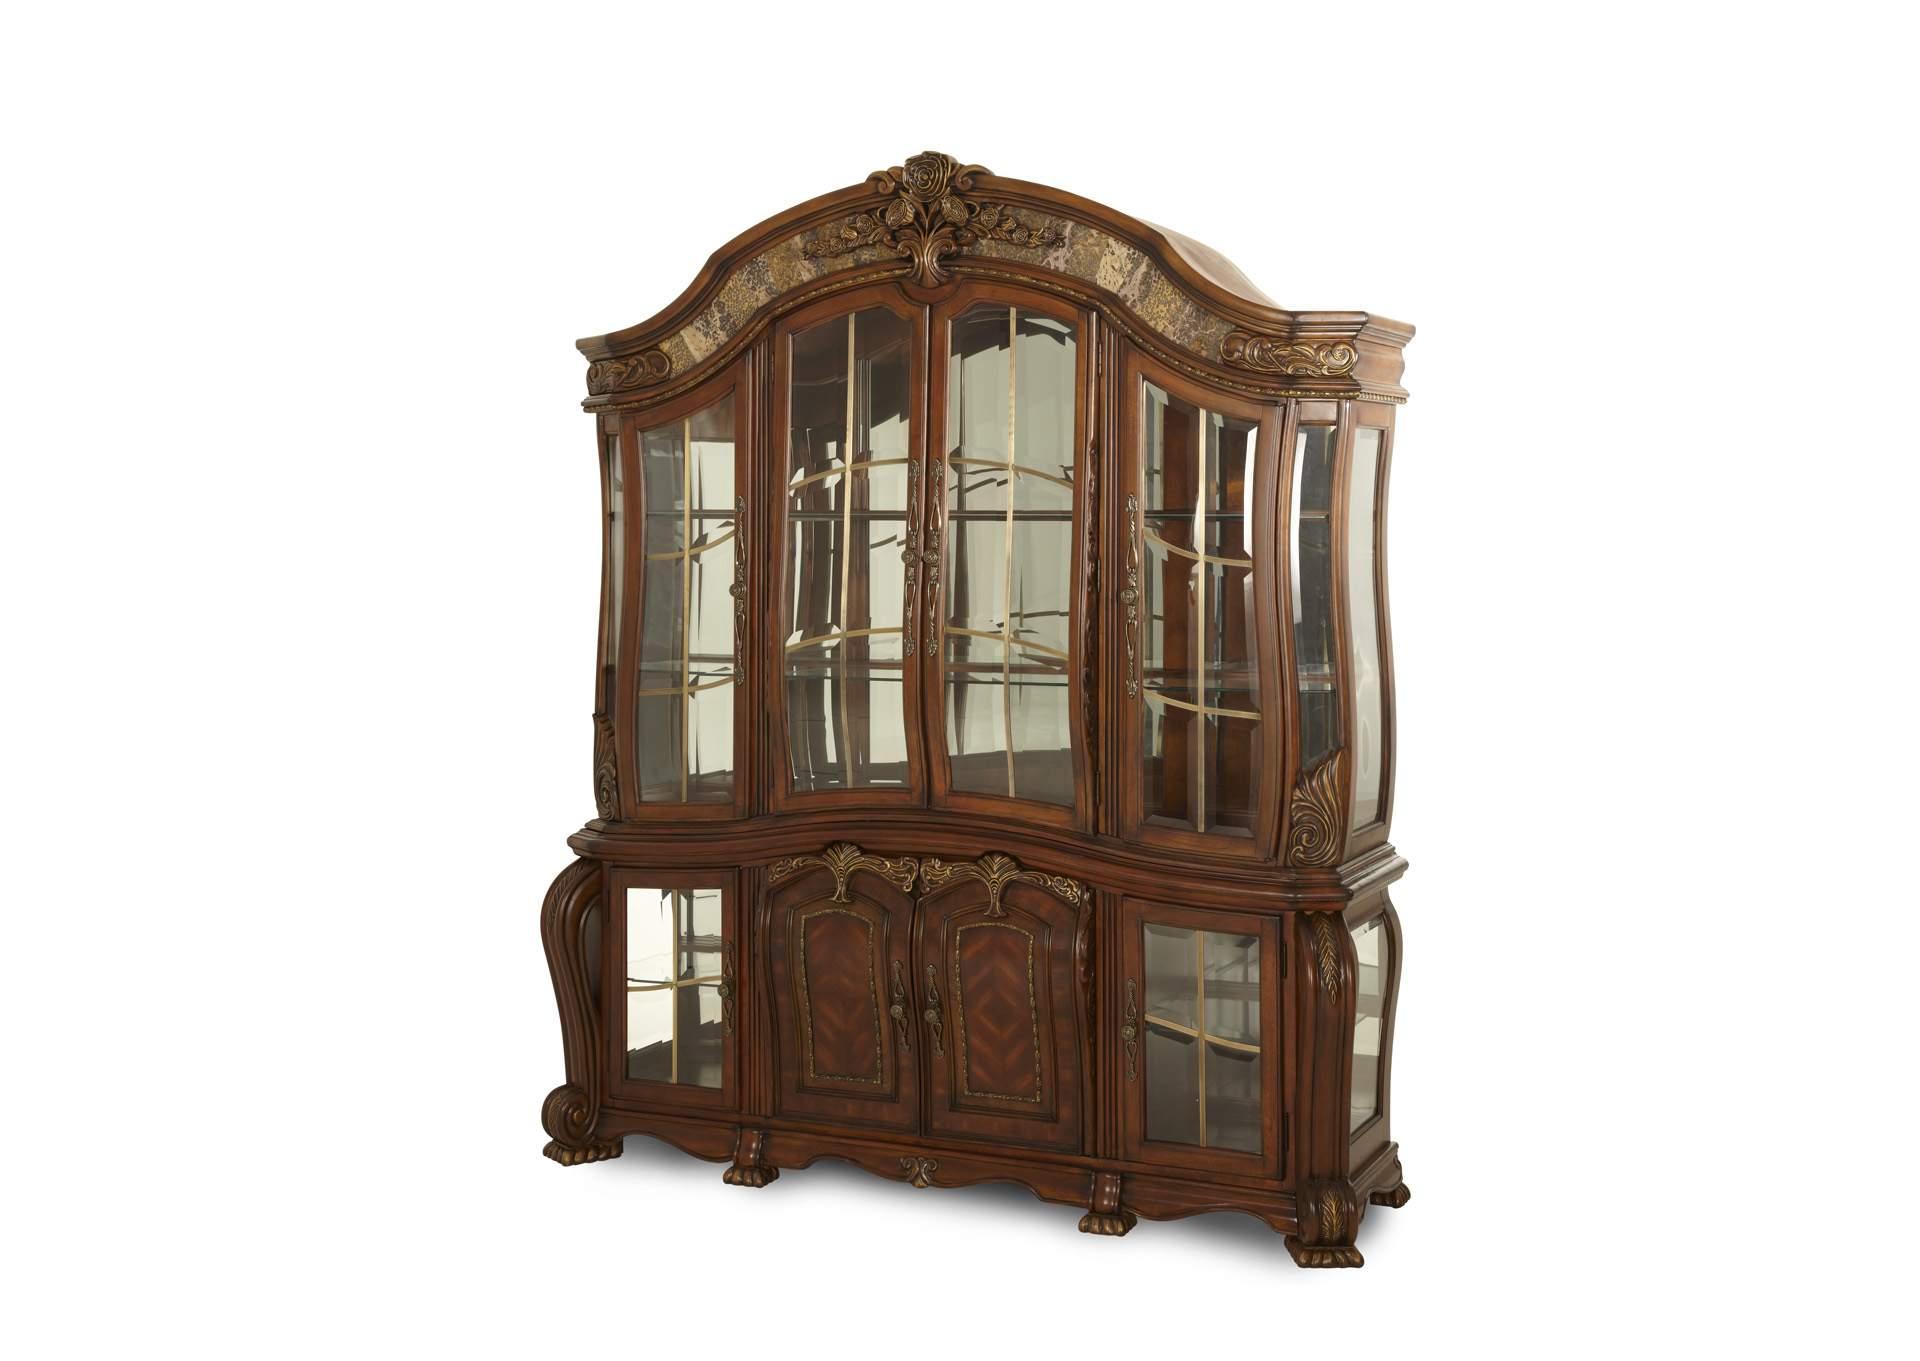 V. Watts Furniture